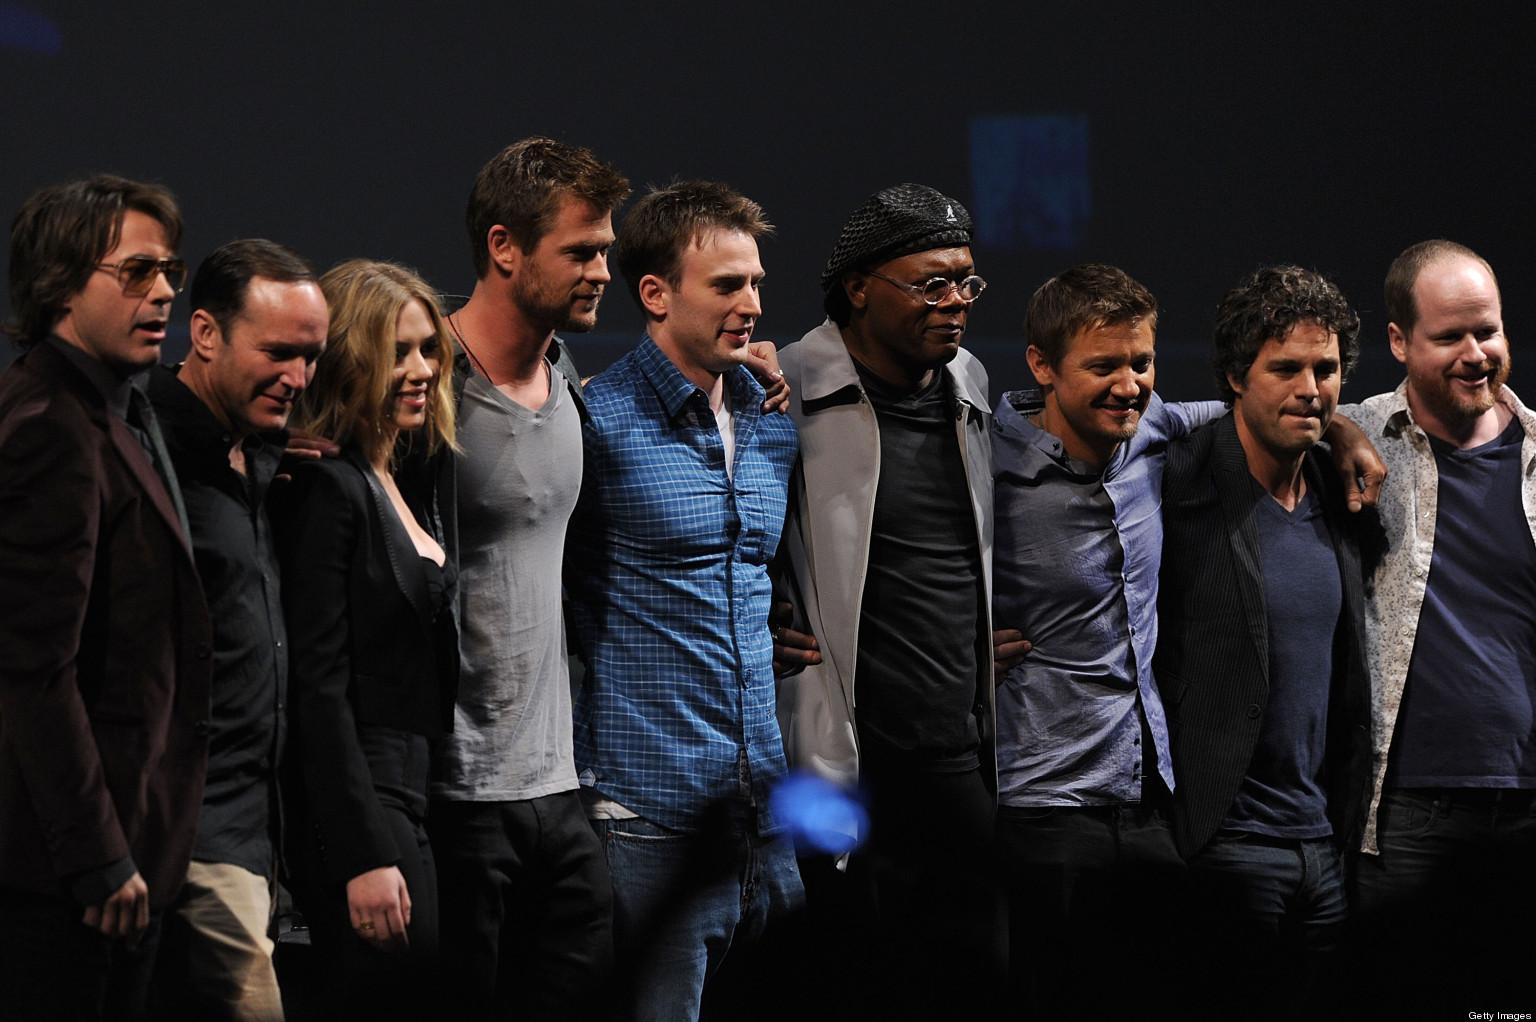 'The Avengers' At Oscars: Robert Downey Jr. & Cast Heading ...